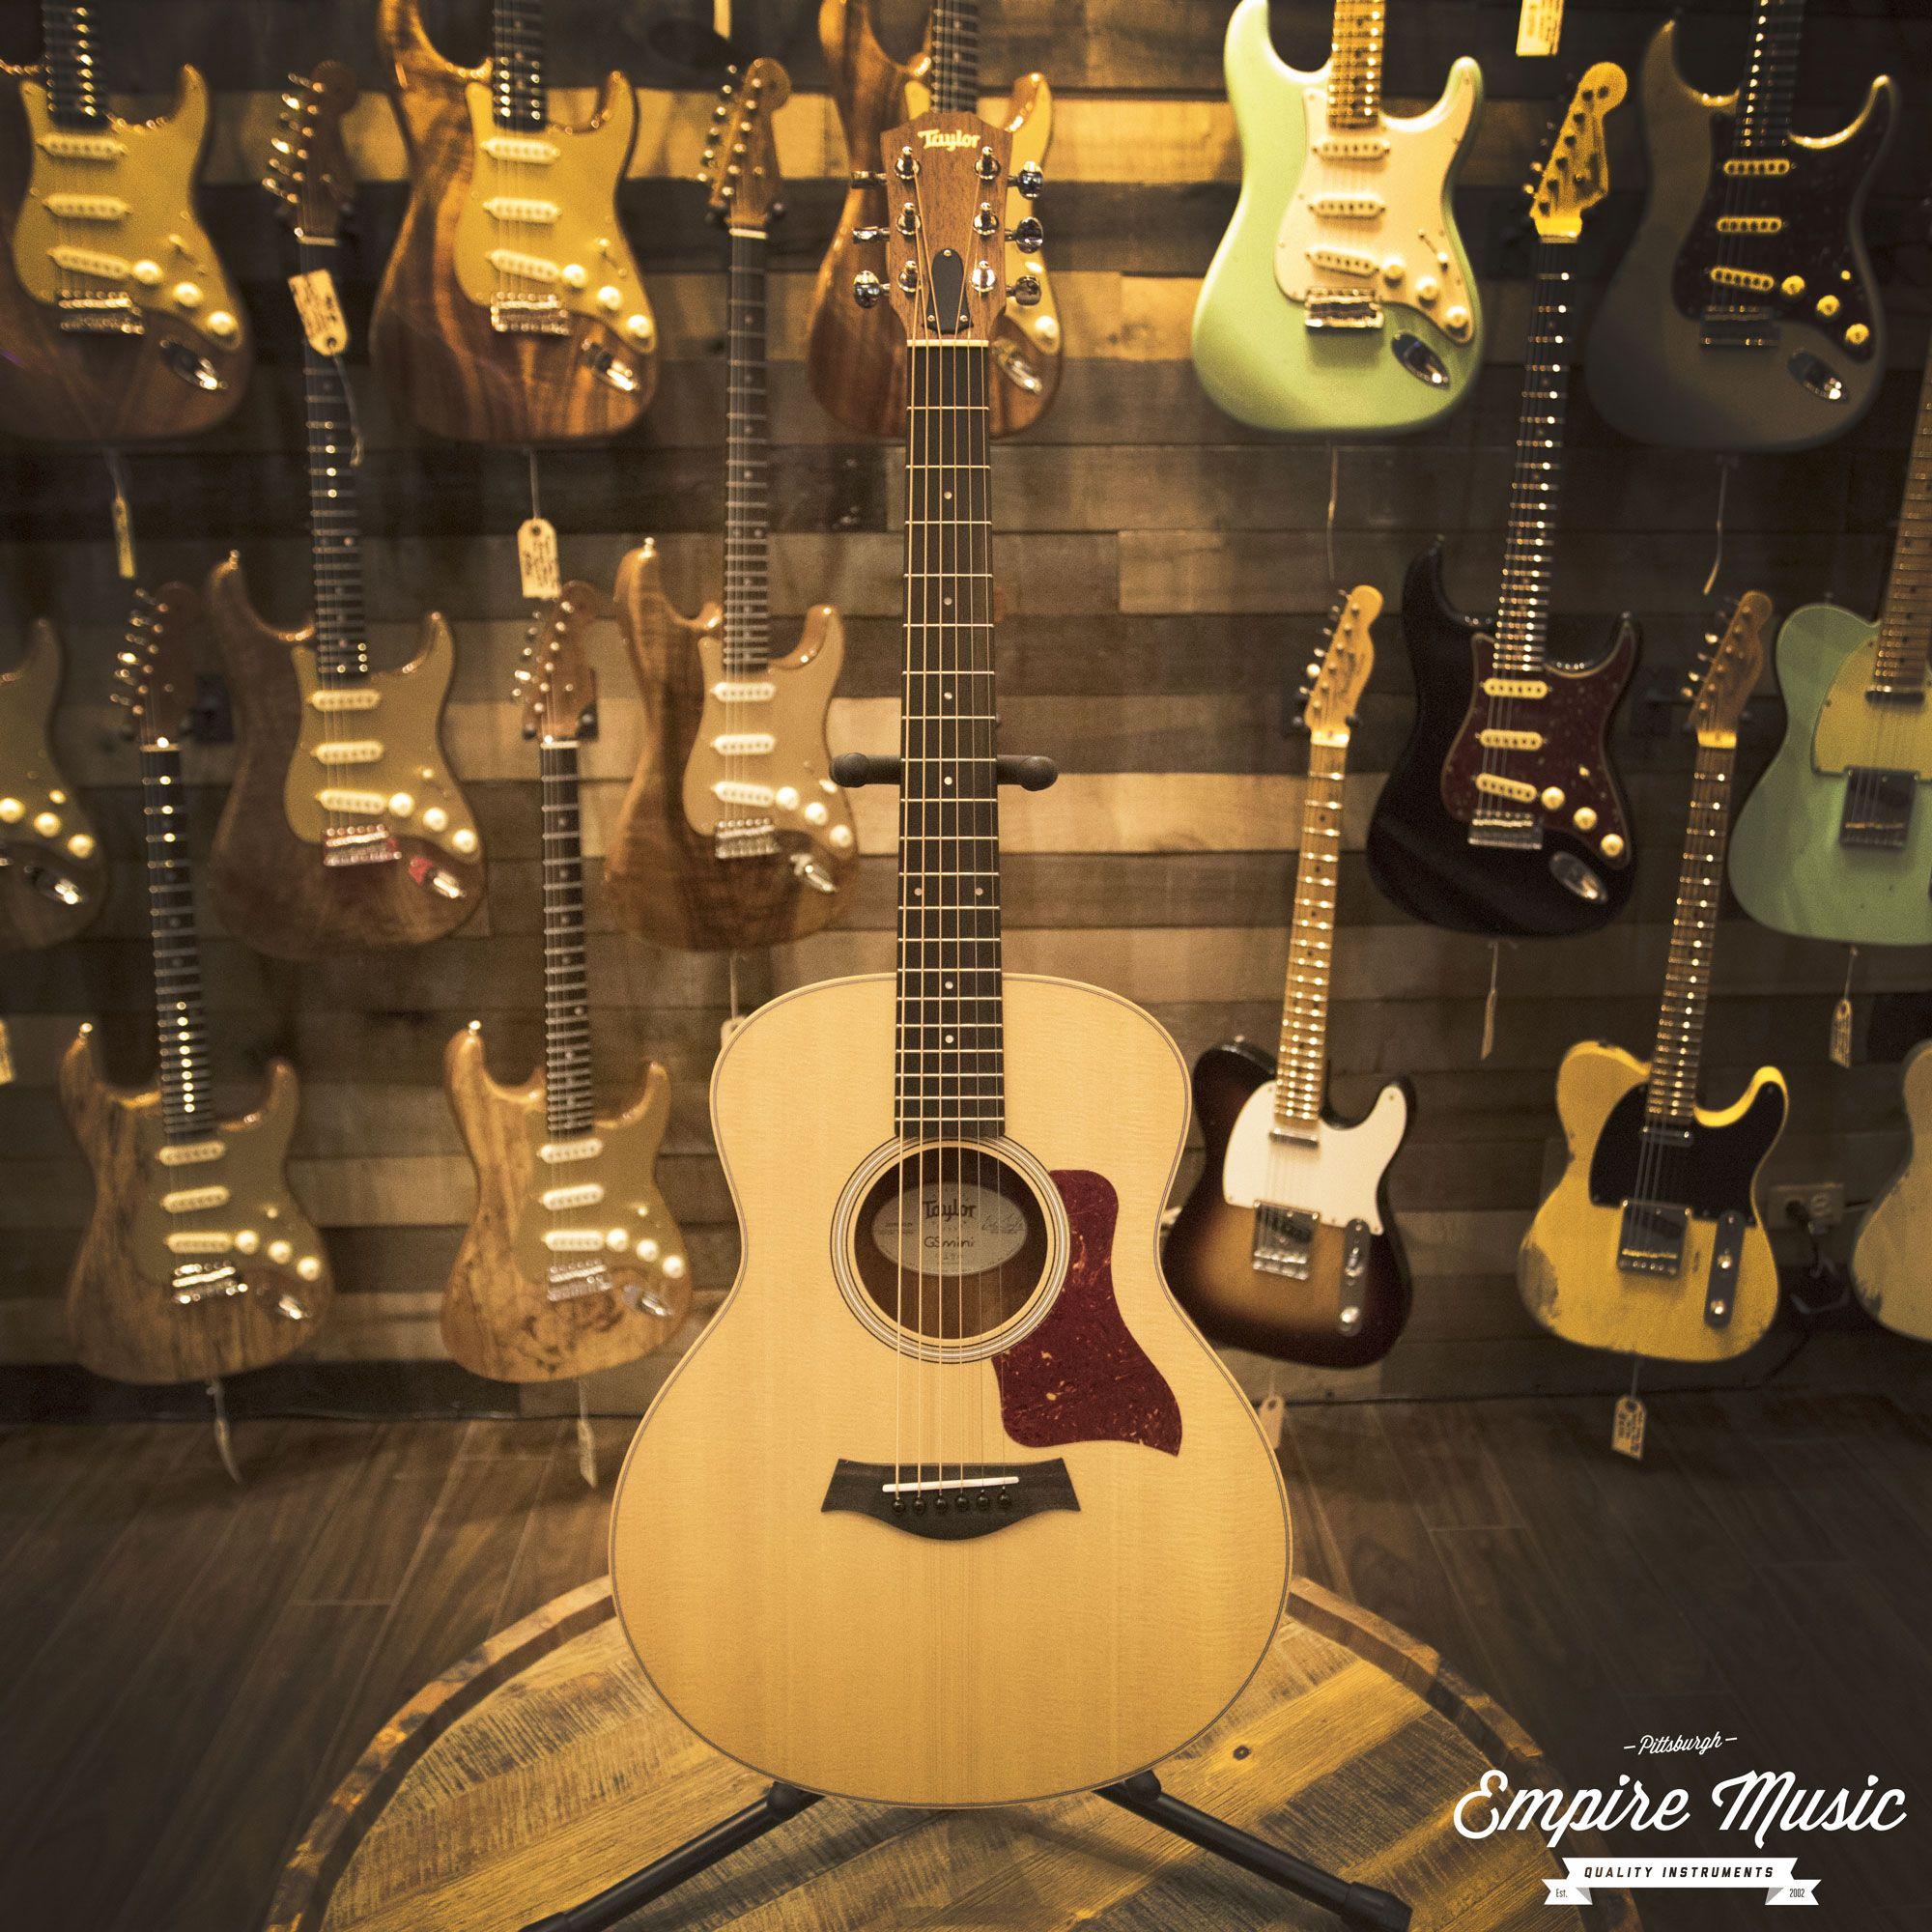 Ends 1/31/2019 #giveaway #win #contest #guitar #guitargiveaway | Win